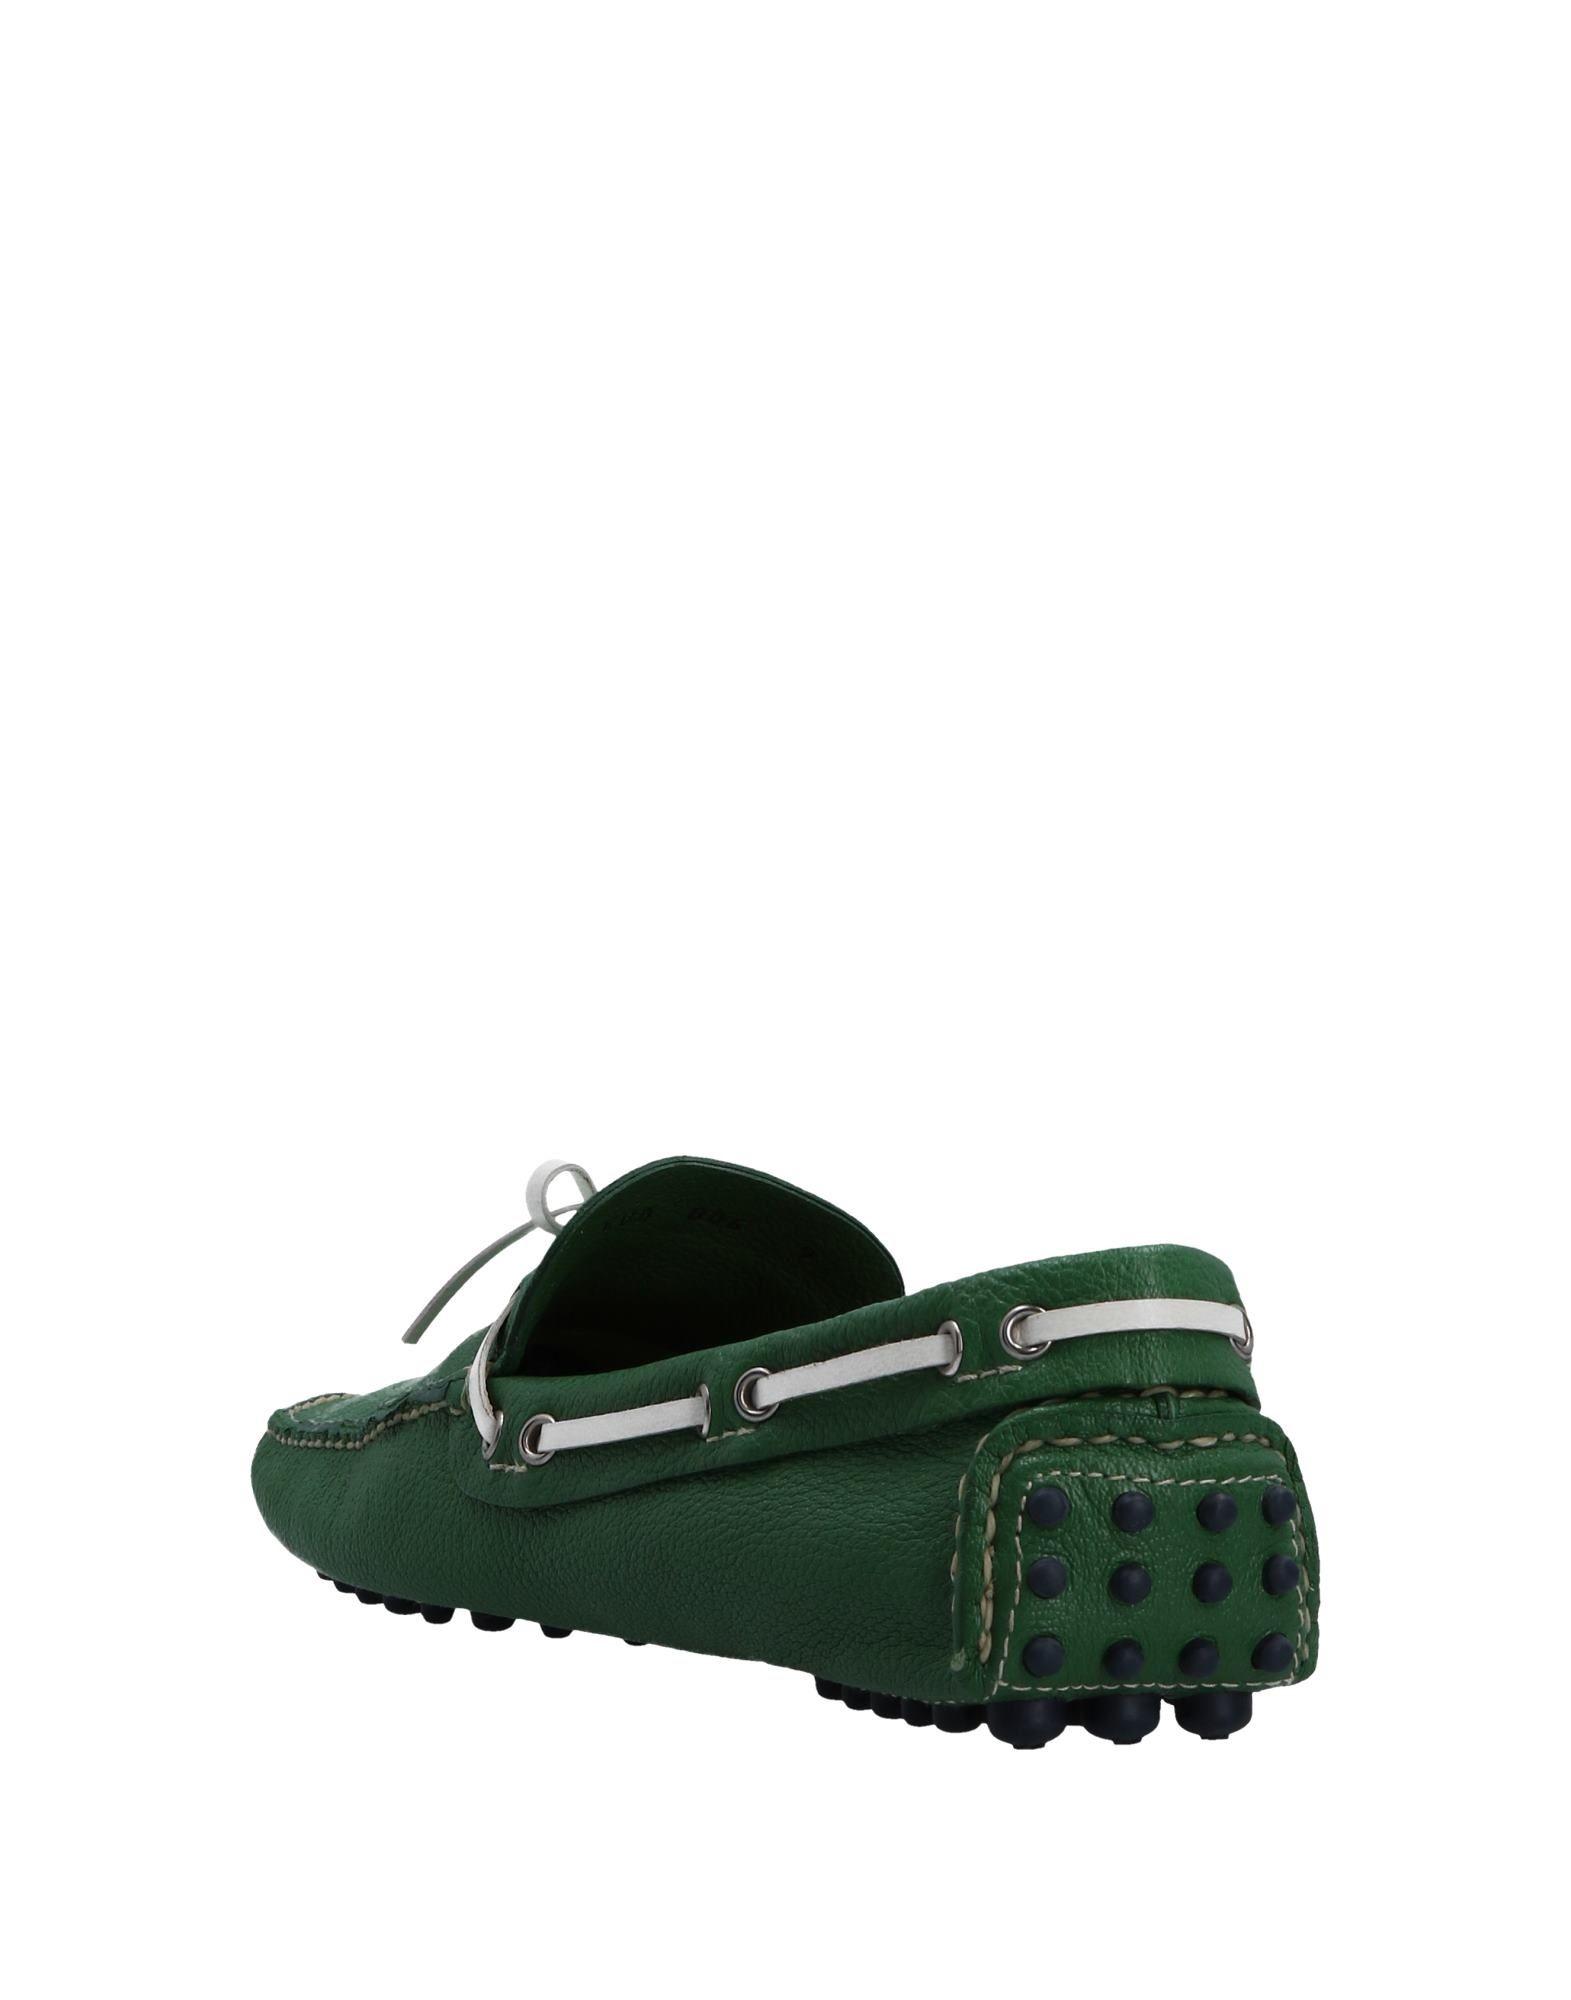 Carshoe Gute Mokassins Herren  11526466VS Gute Carshoe Qualität beliebte Schuhe 5d7531